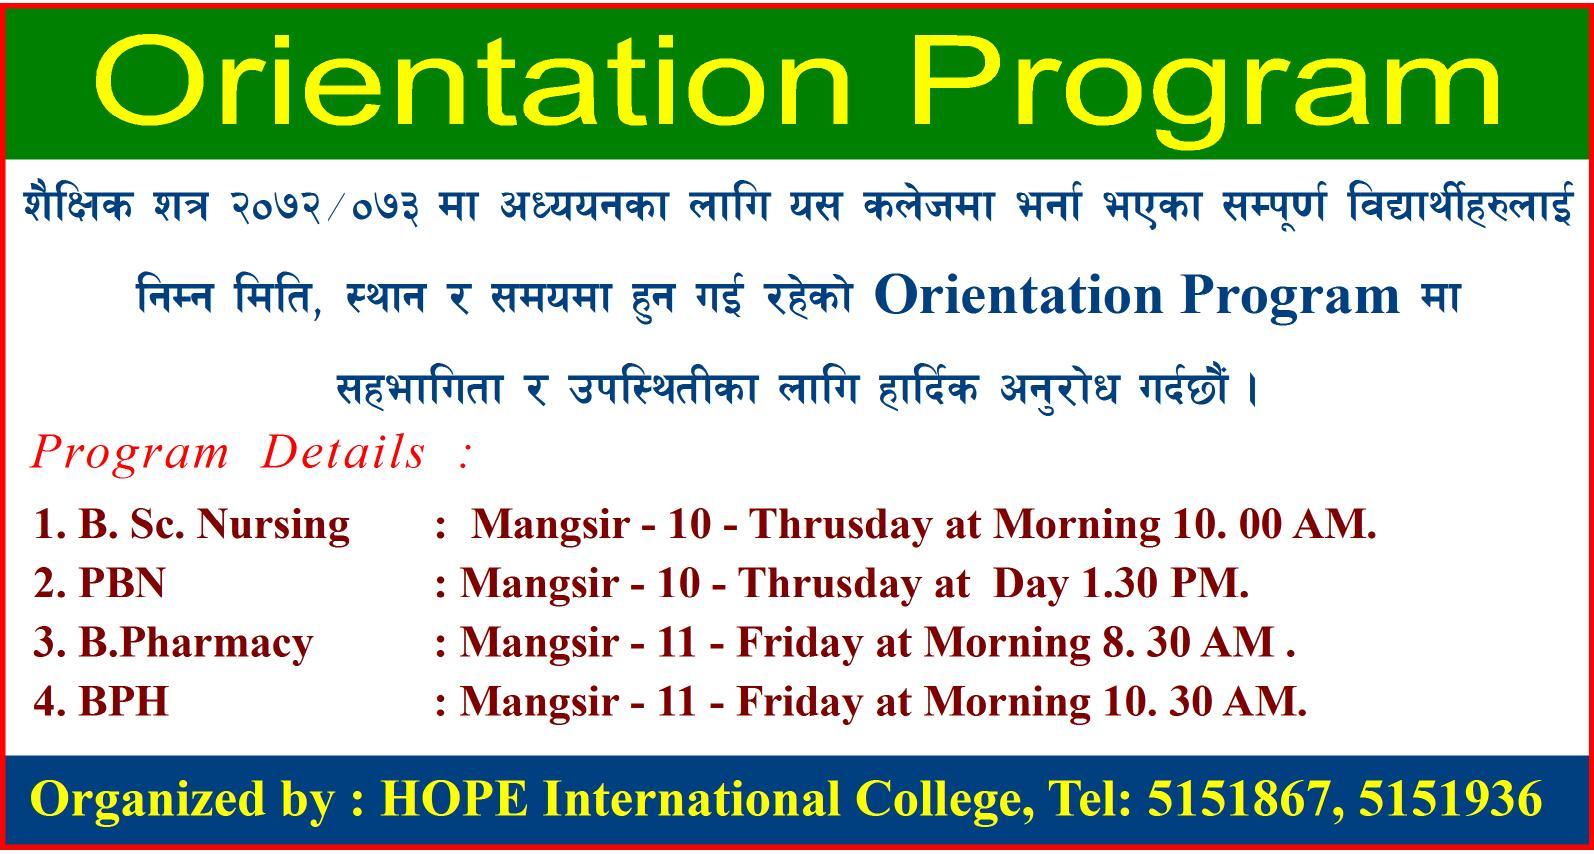 Orientation Program 2072